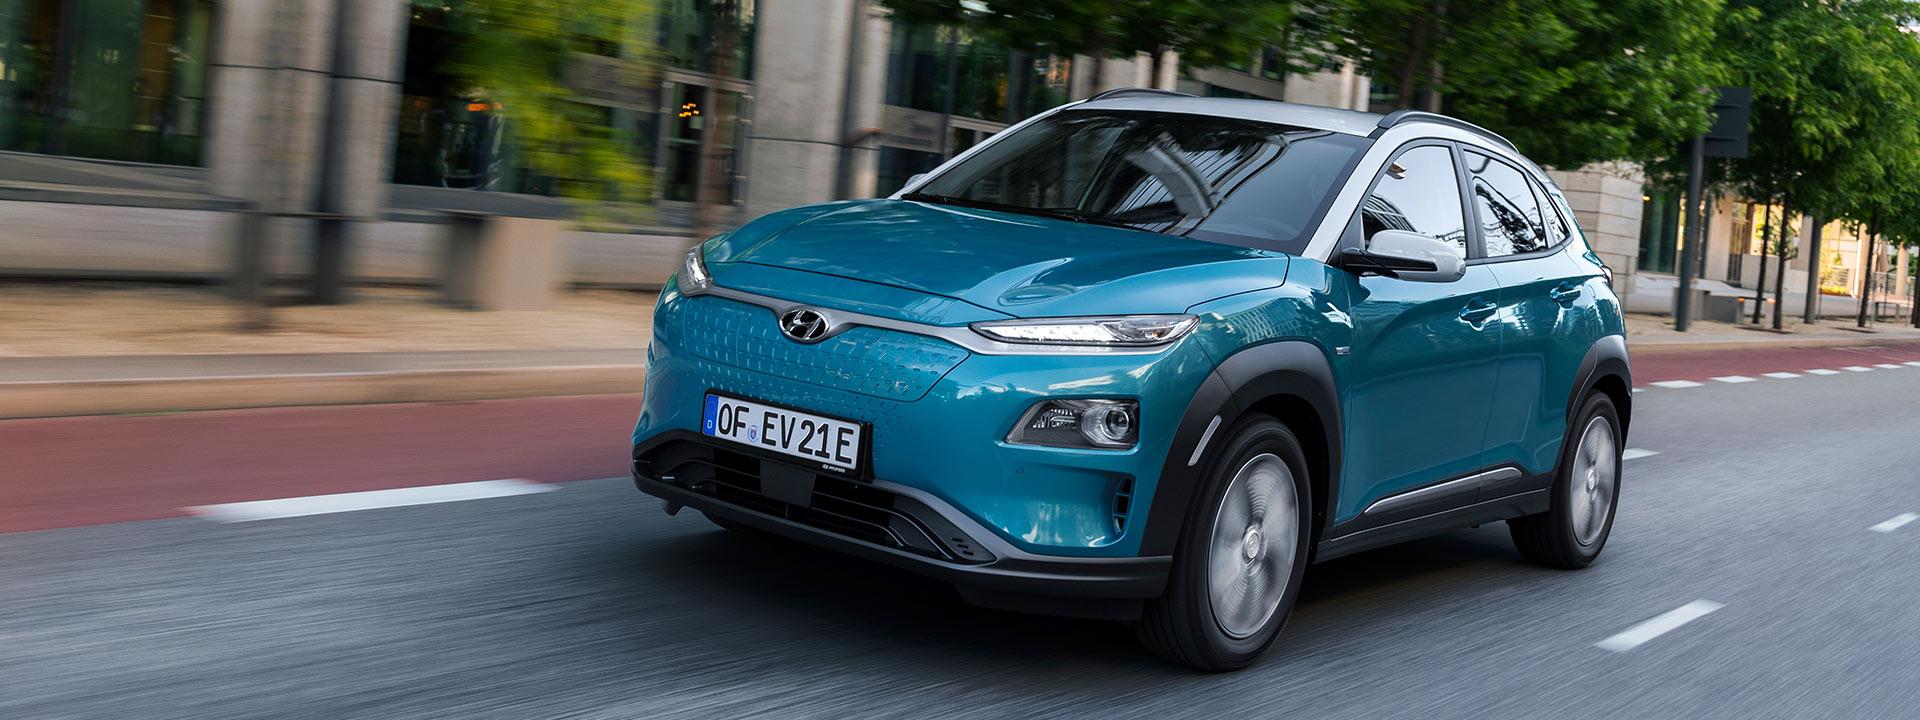 Hyundai Kona Elektro 8 Jahre Garantie